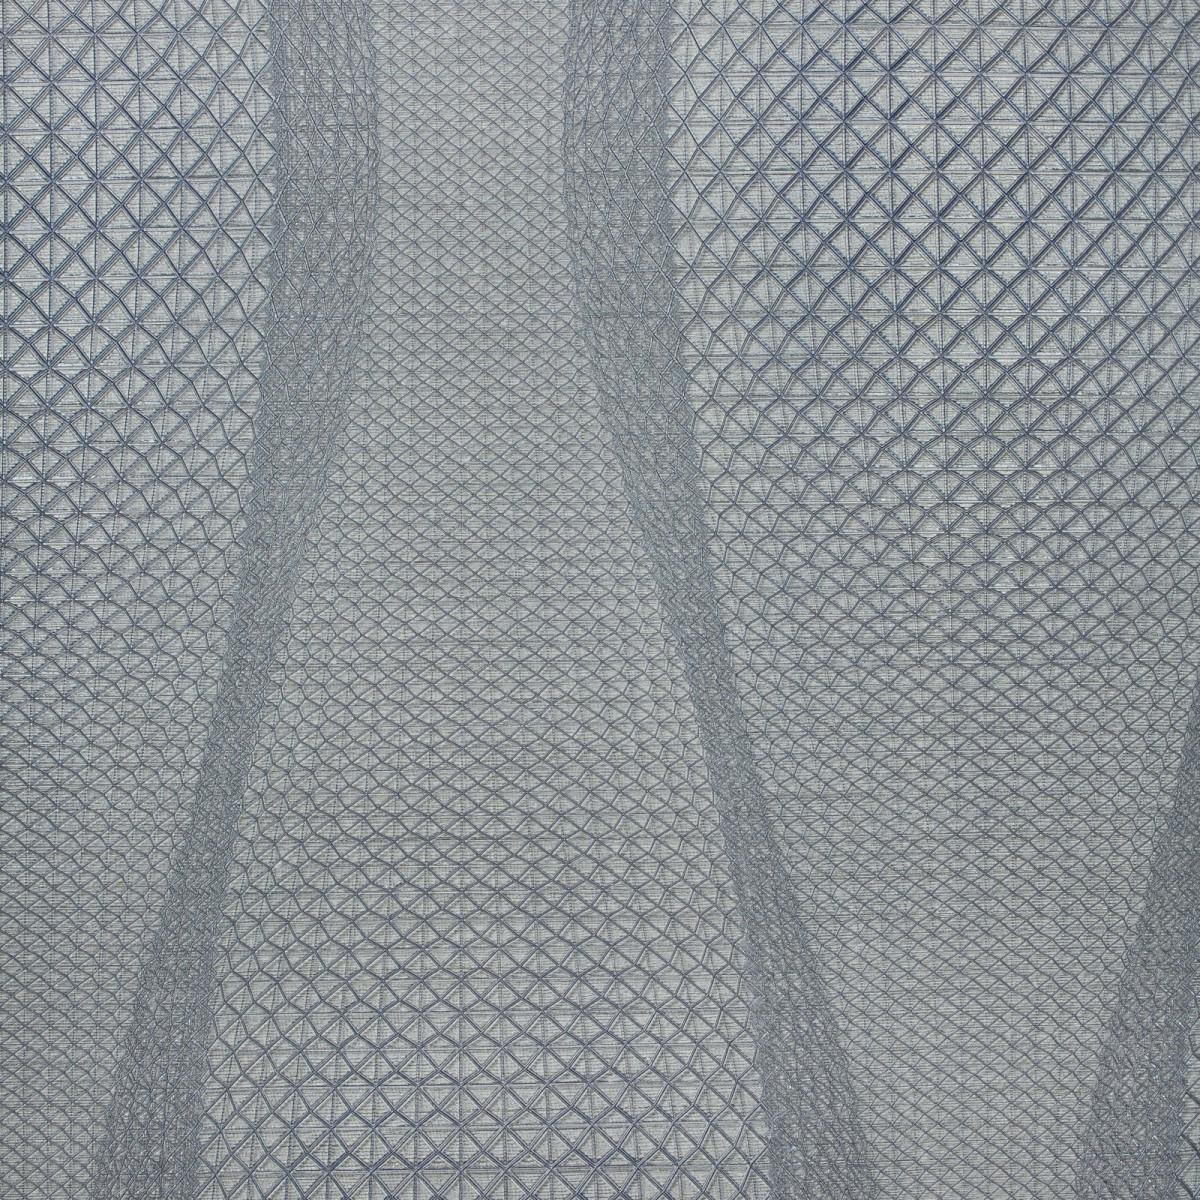 Обои флизелиновые Seela Modern Touch серые 1.06 м 6527-5